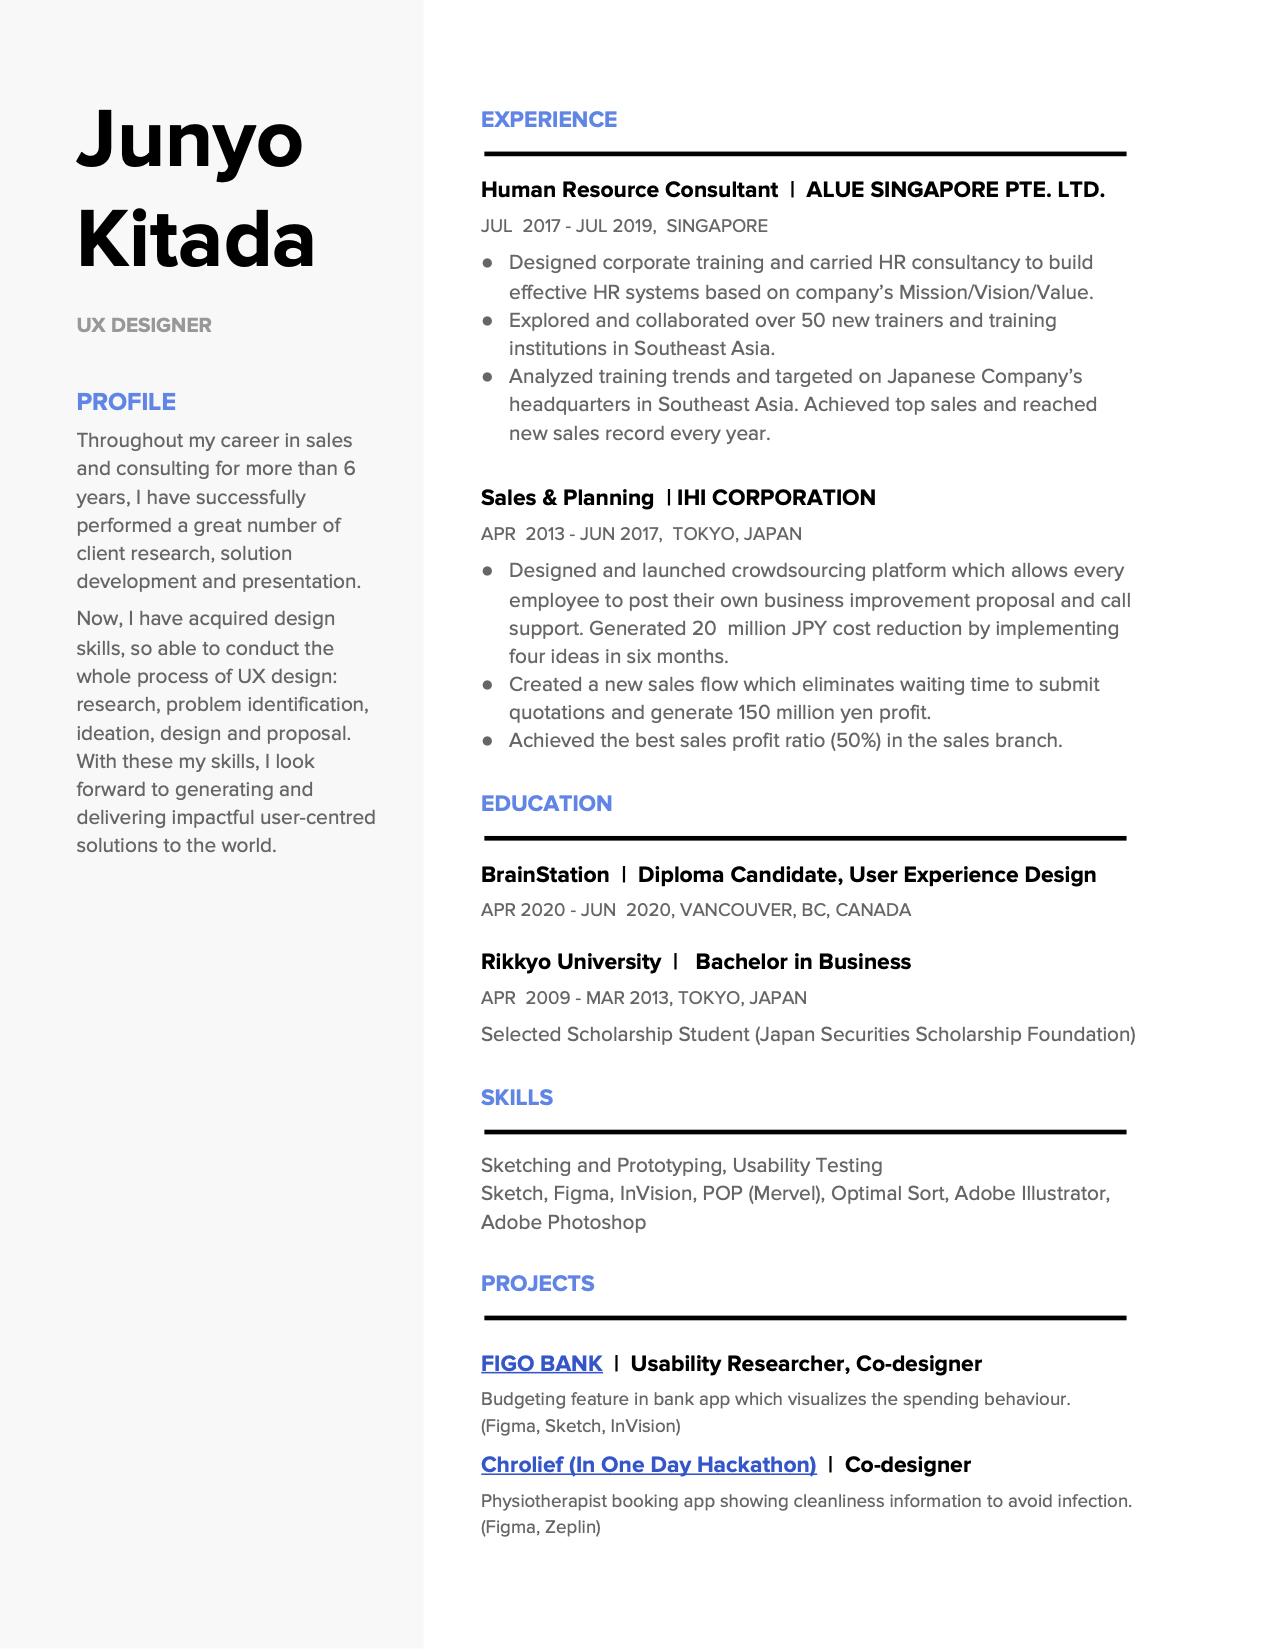 Resume_Junyo-Kitada_Portfolio